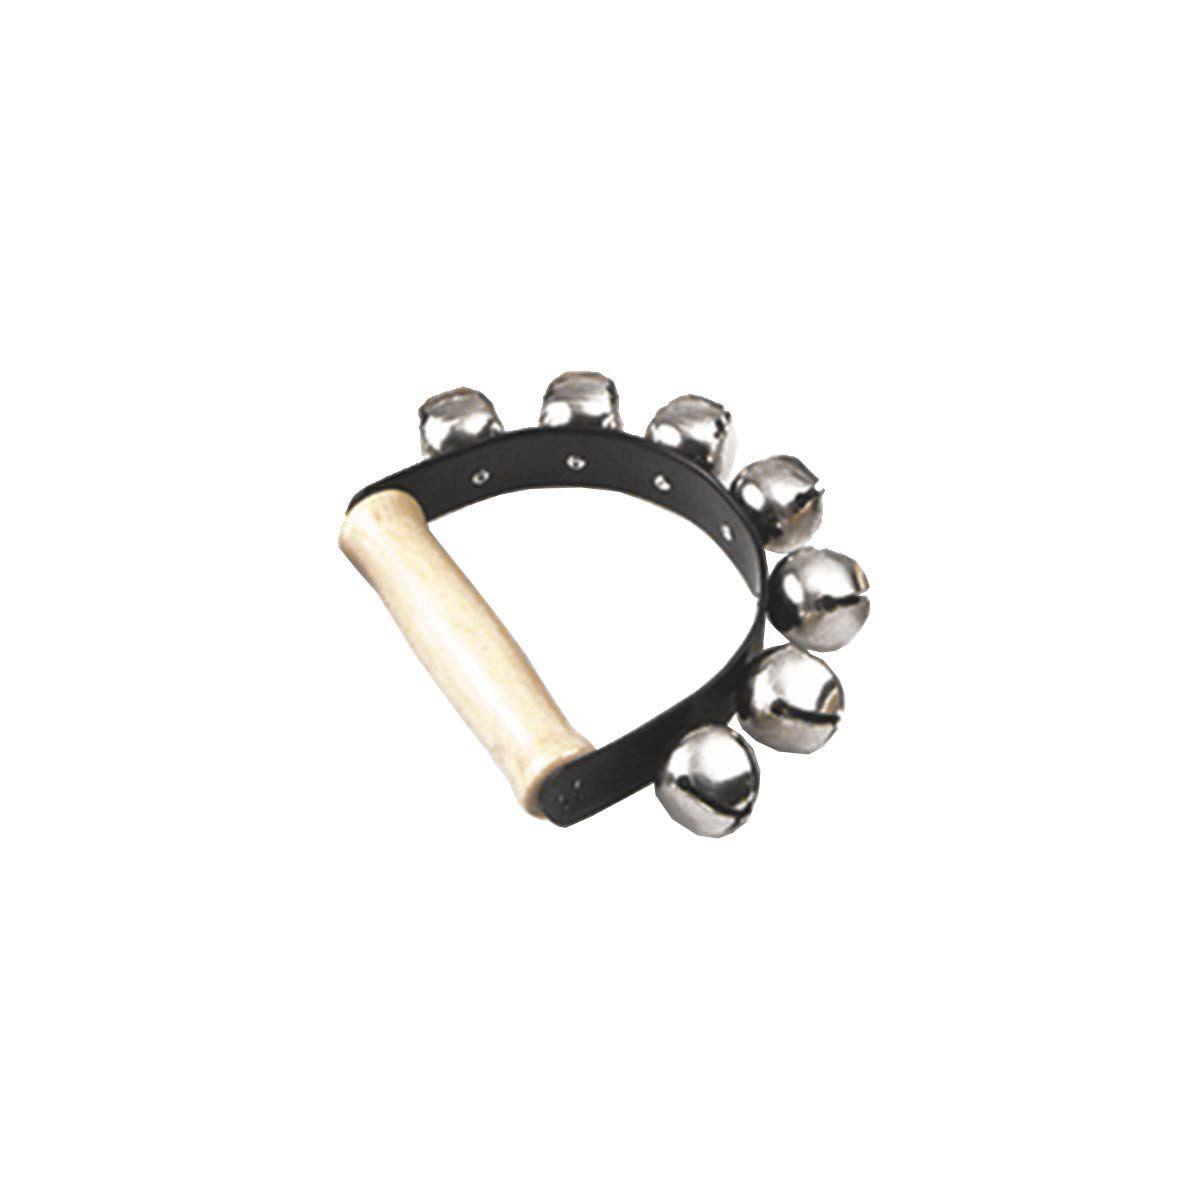 Campanela de Mão c/ 7 Esferas de Metal - TB 3007 CSR